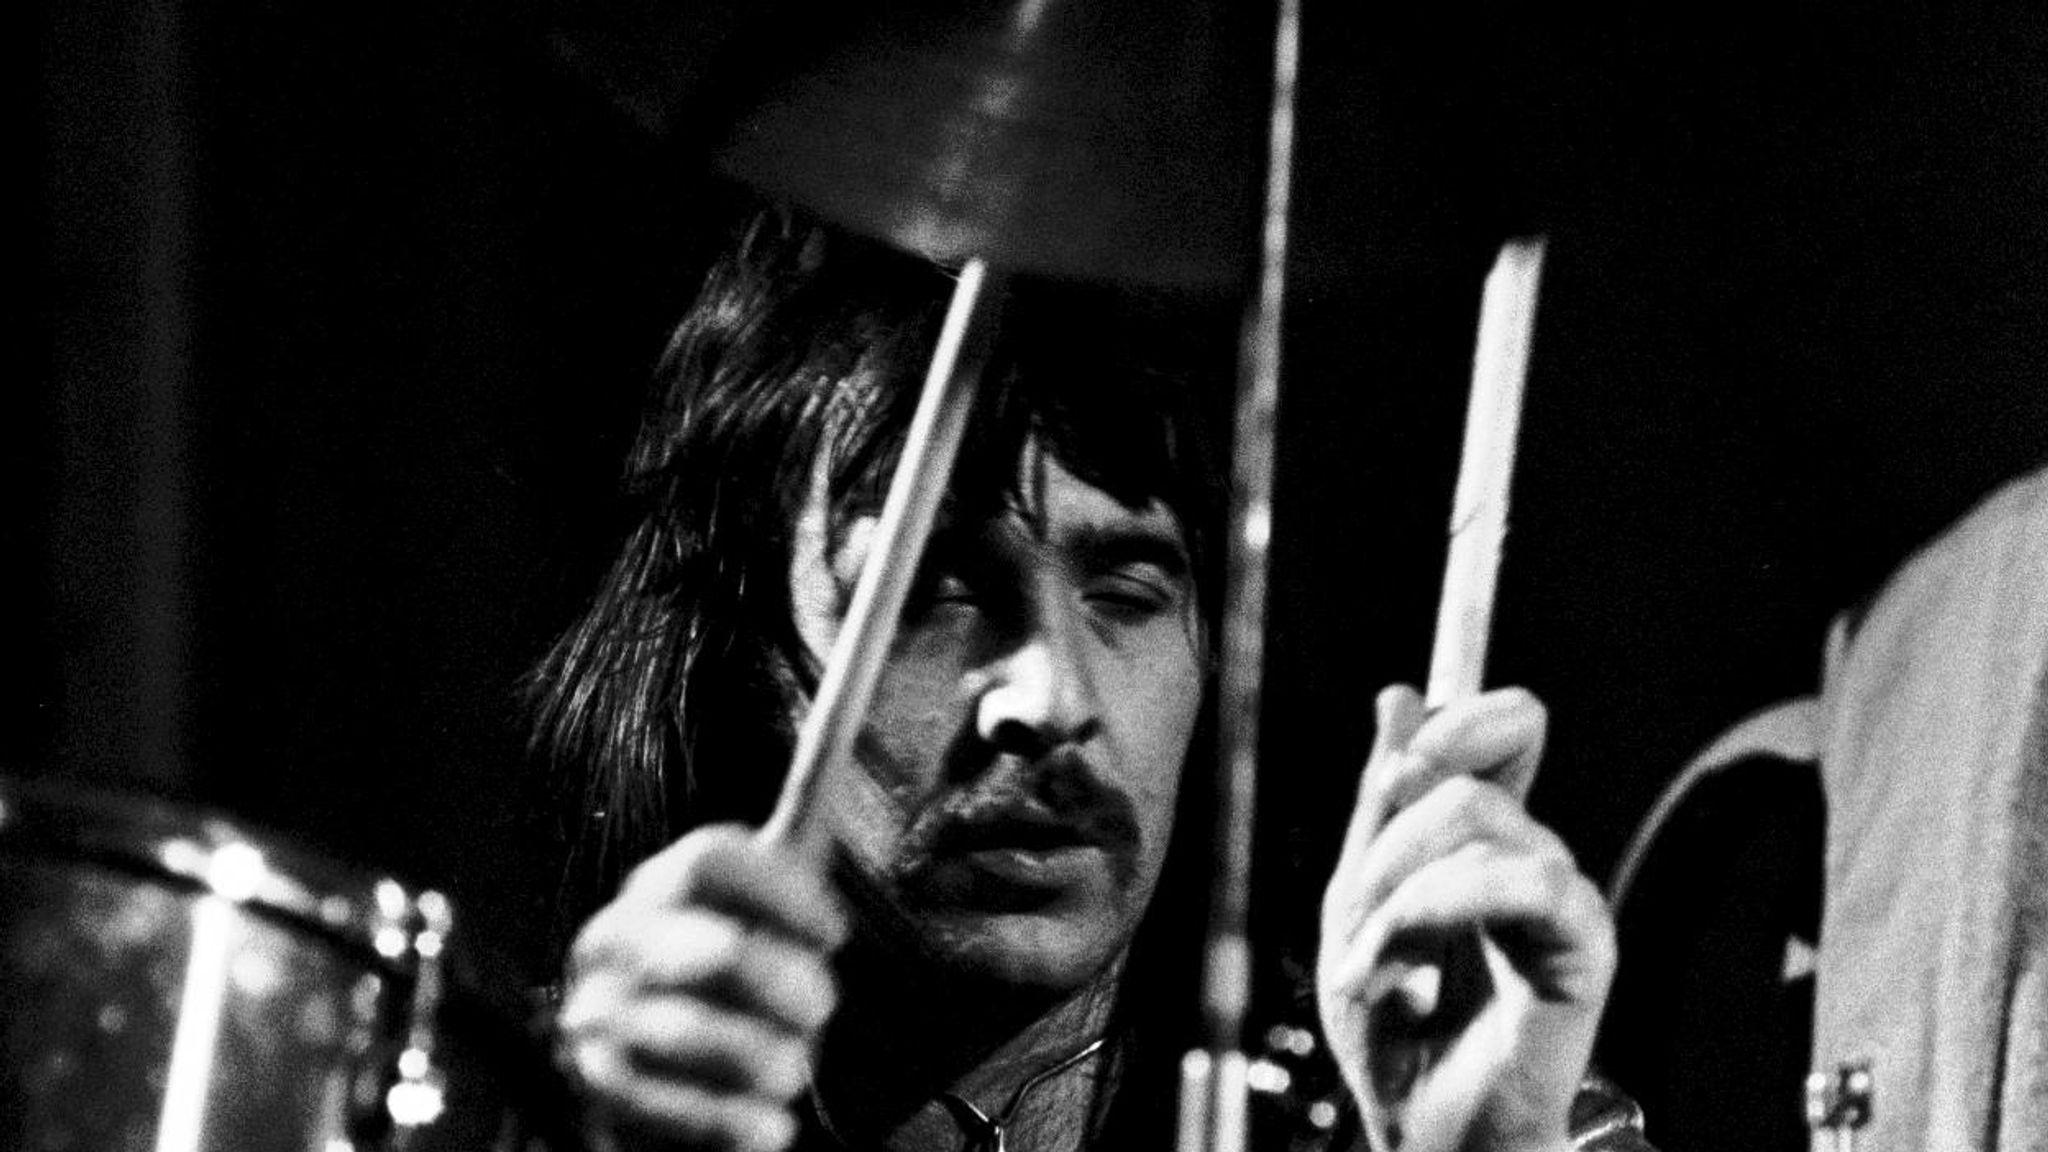 Lee Kerslake Drummer For Ozzy Osbourne And Uriah Heep Dies At 73 After Cancer Battle Ents Arts News Sky News